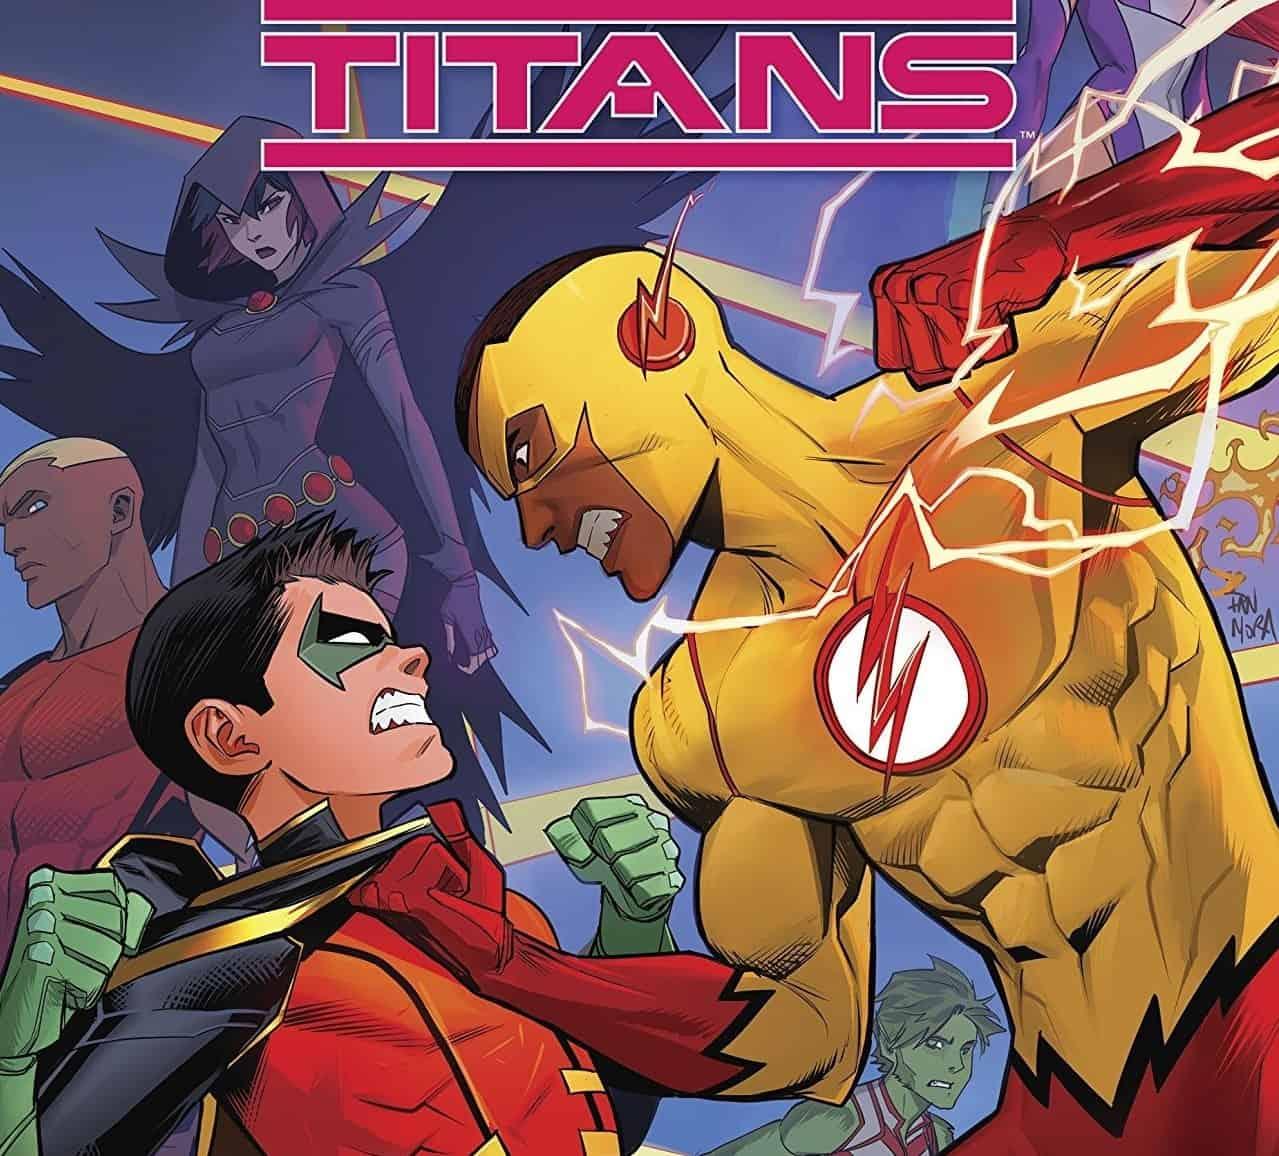 Teen titans final episode, Huge shaking tits